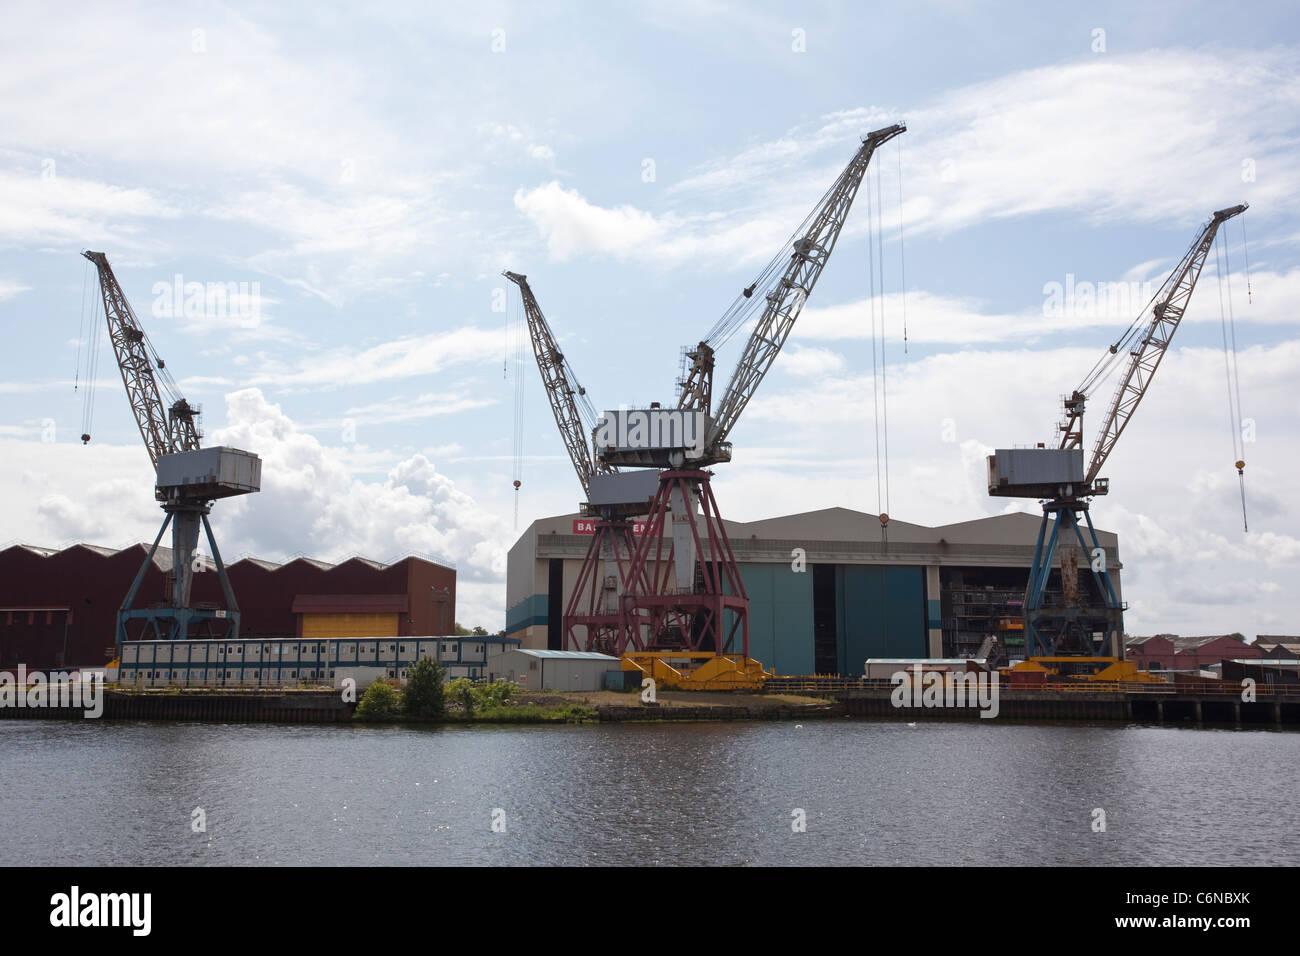 BAE Systems Govan shipbuilding yard, Govan, Glasgow. Photo:Jeff Gilbert - Stock Image